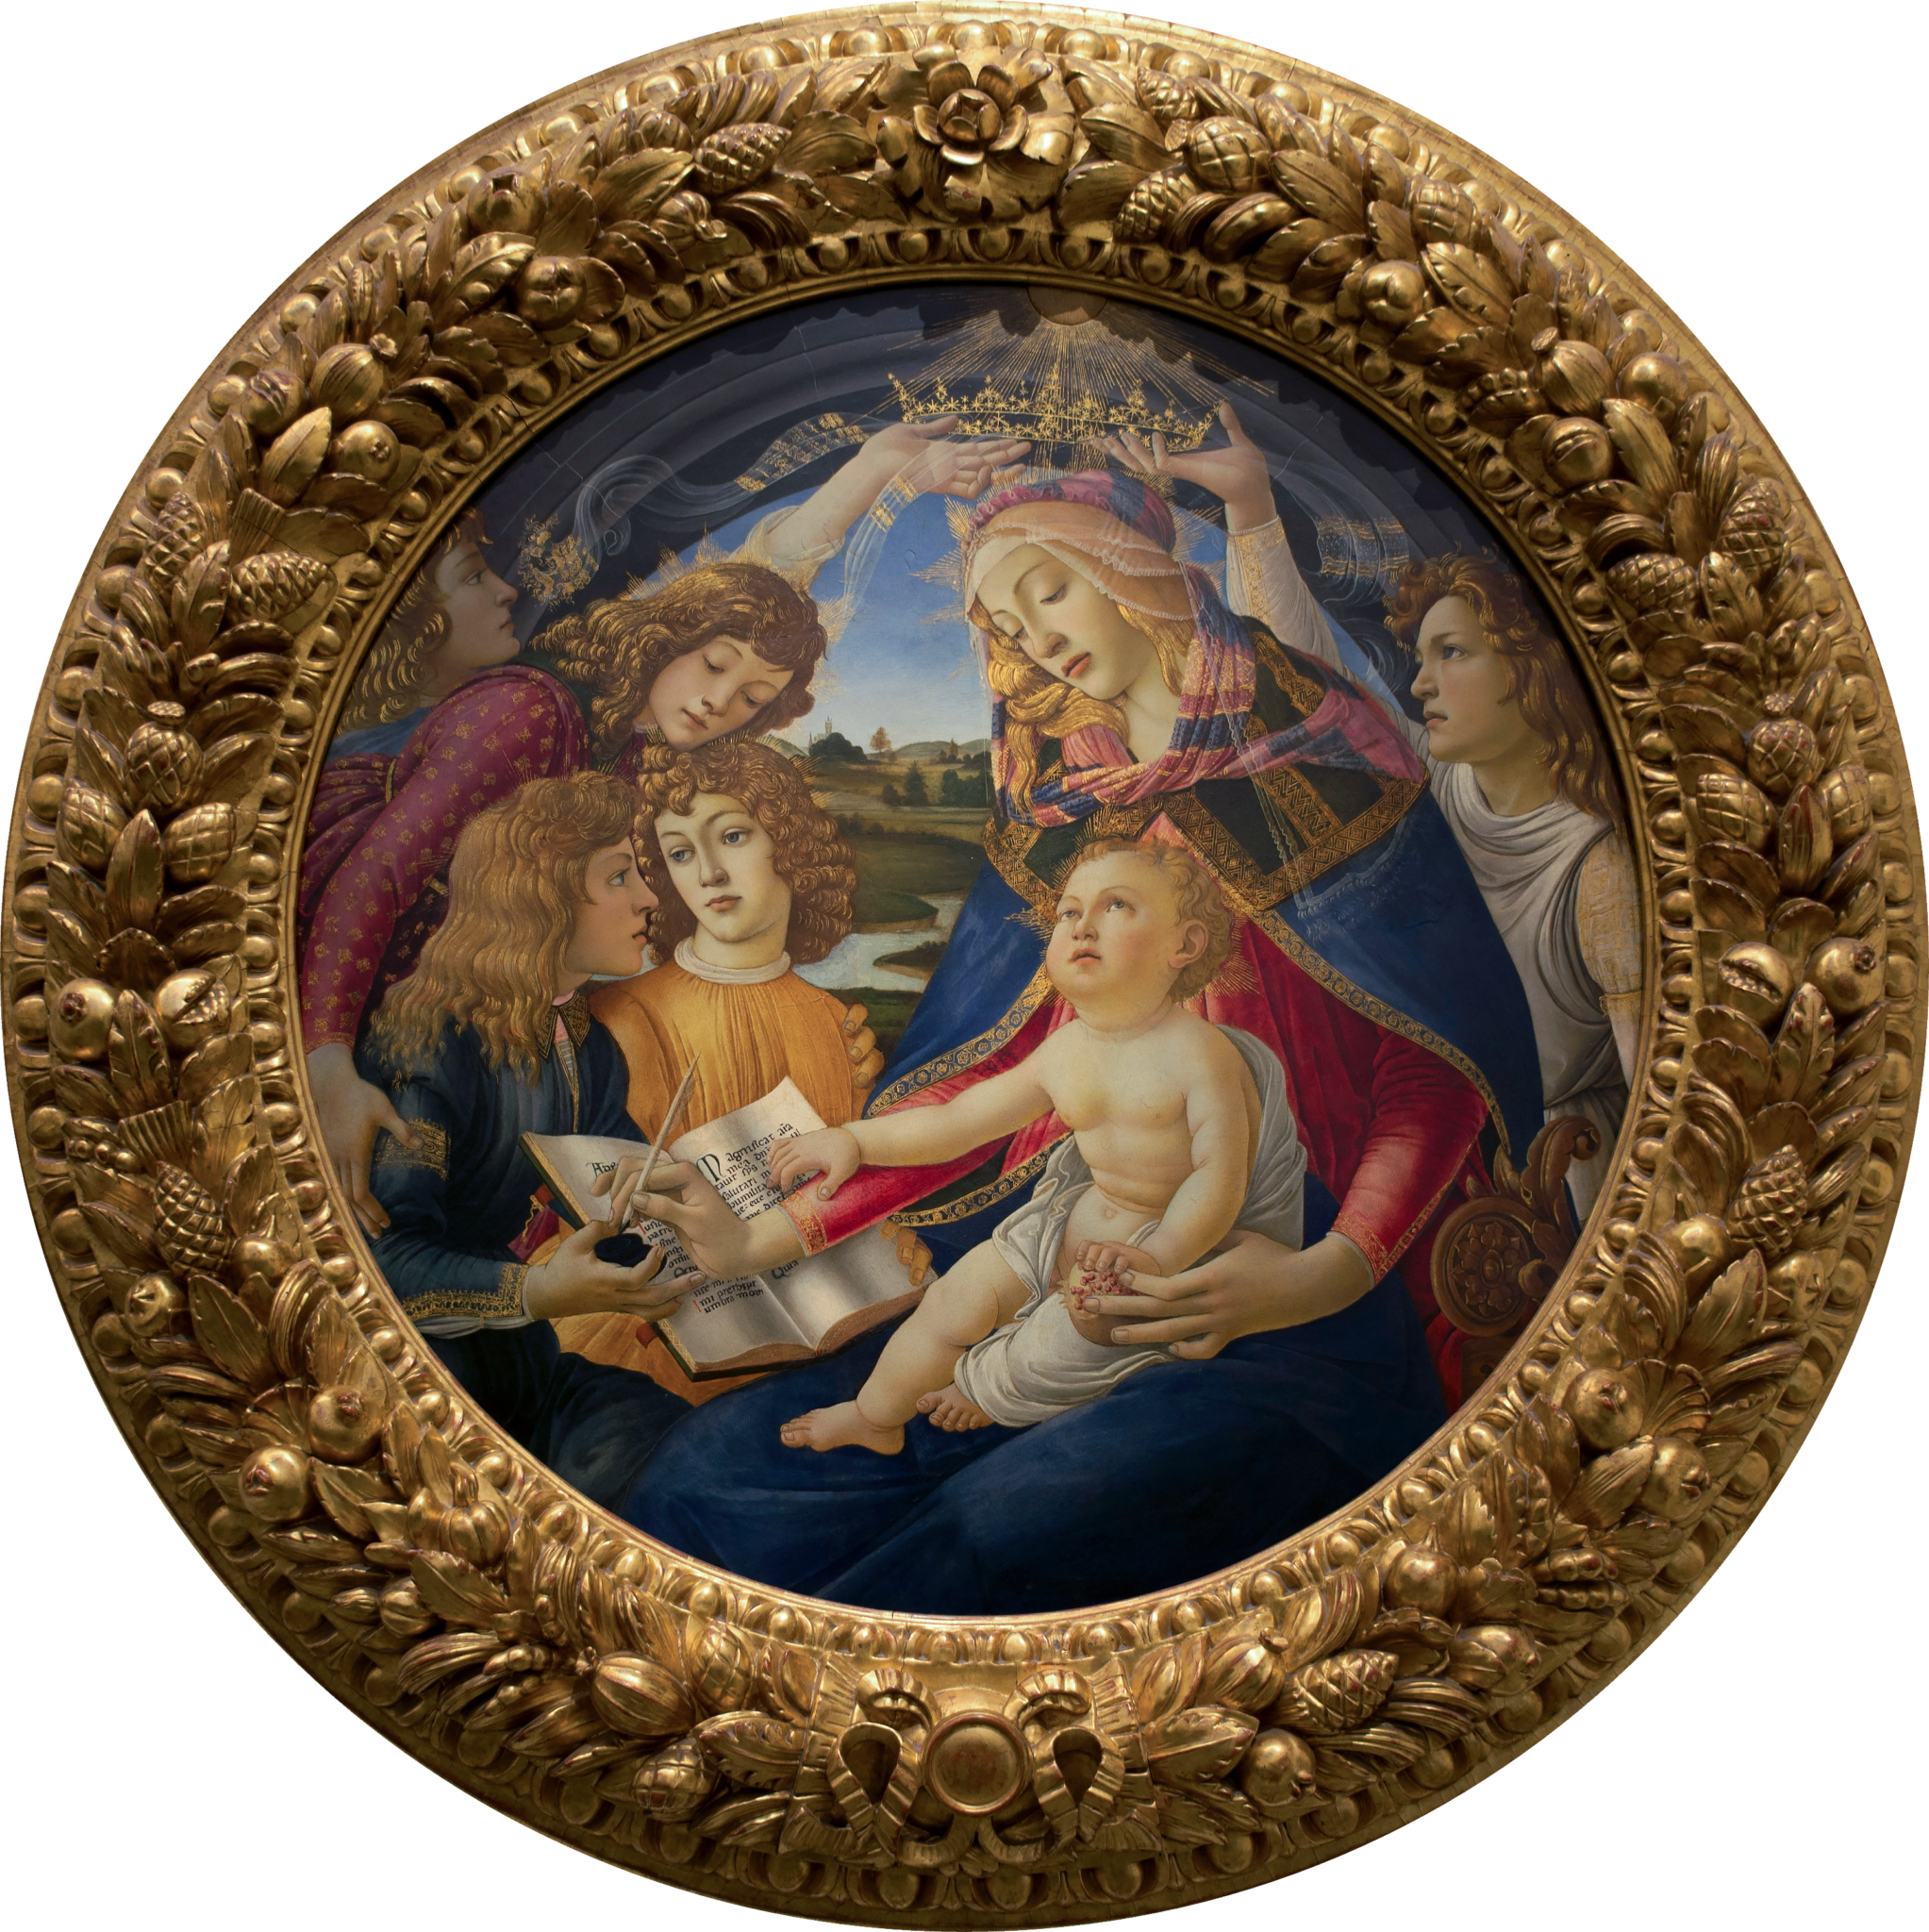 Madonna of the Magnificat, Sandro Botticelli, 1483, Uffizi Gallery, Florence, Italy.